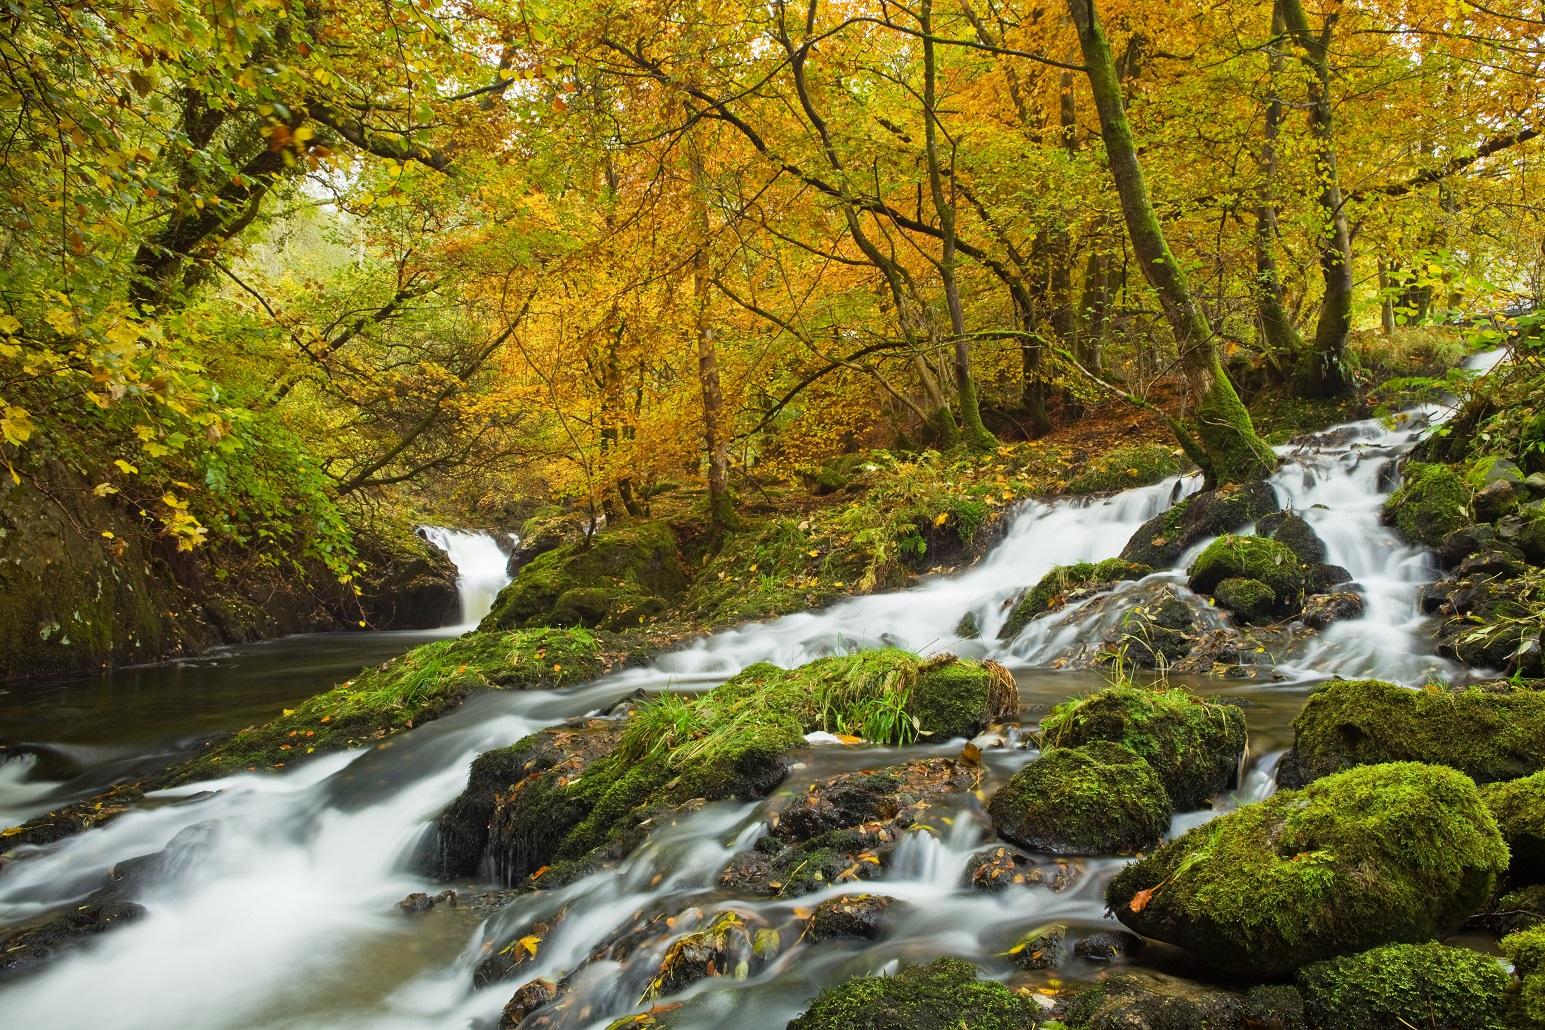 Herfst Schotland - Bala Lake in Snowdonia National Park